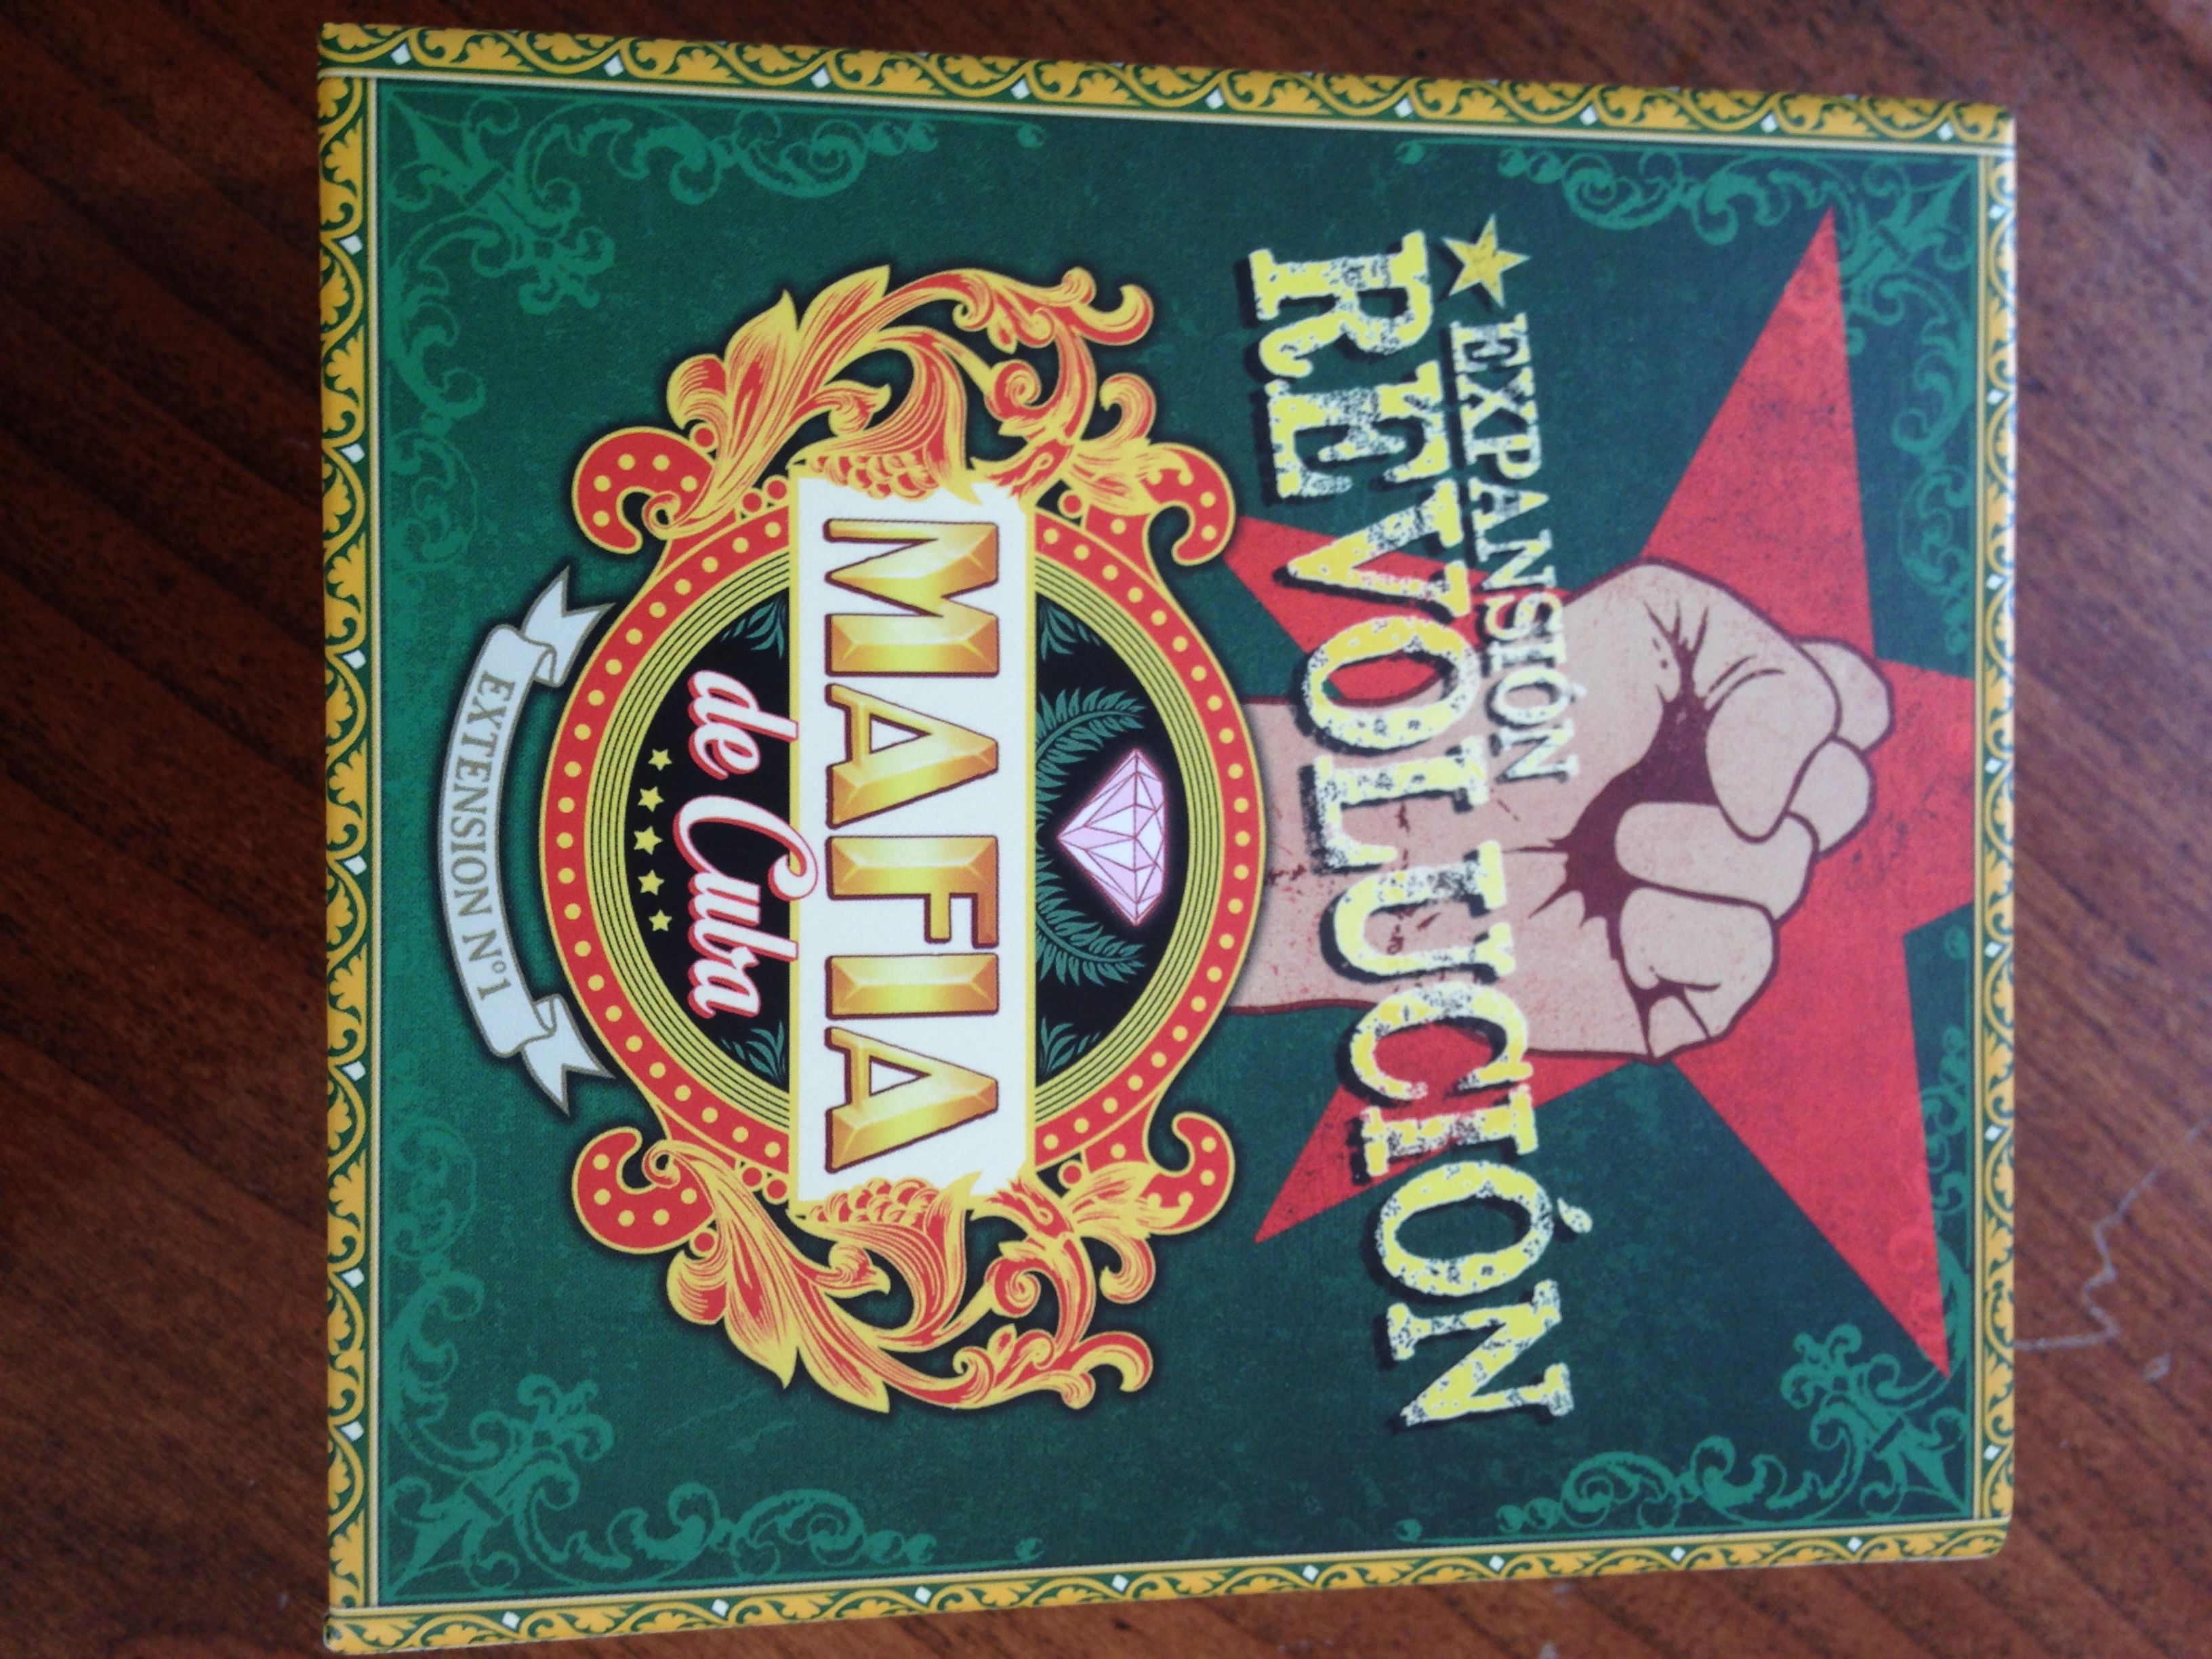 Mafia de Cuba Revolución Mafia, The big boss